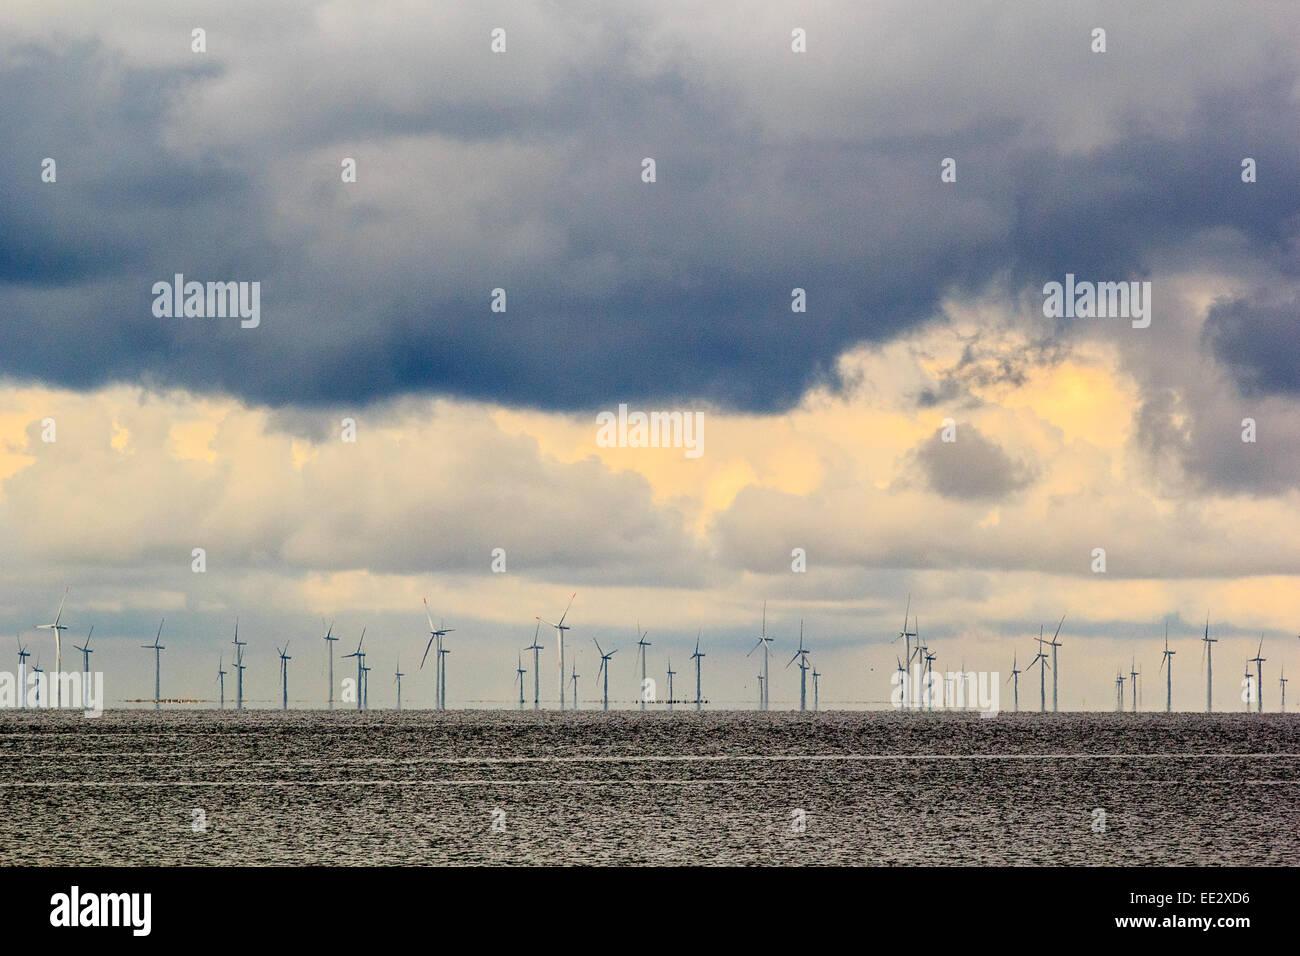 Off shore wind farm in the north sea, off the coast of Sweden. - Stock Image